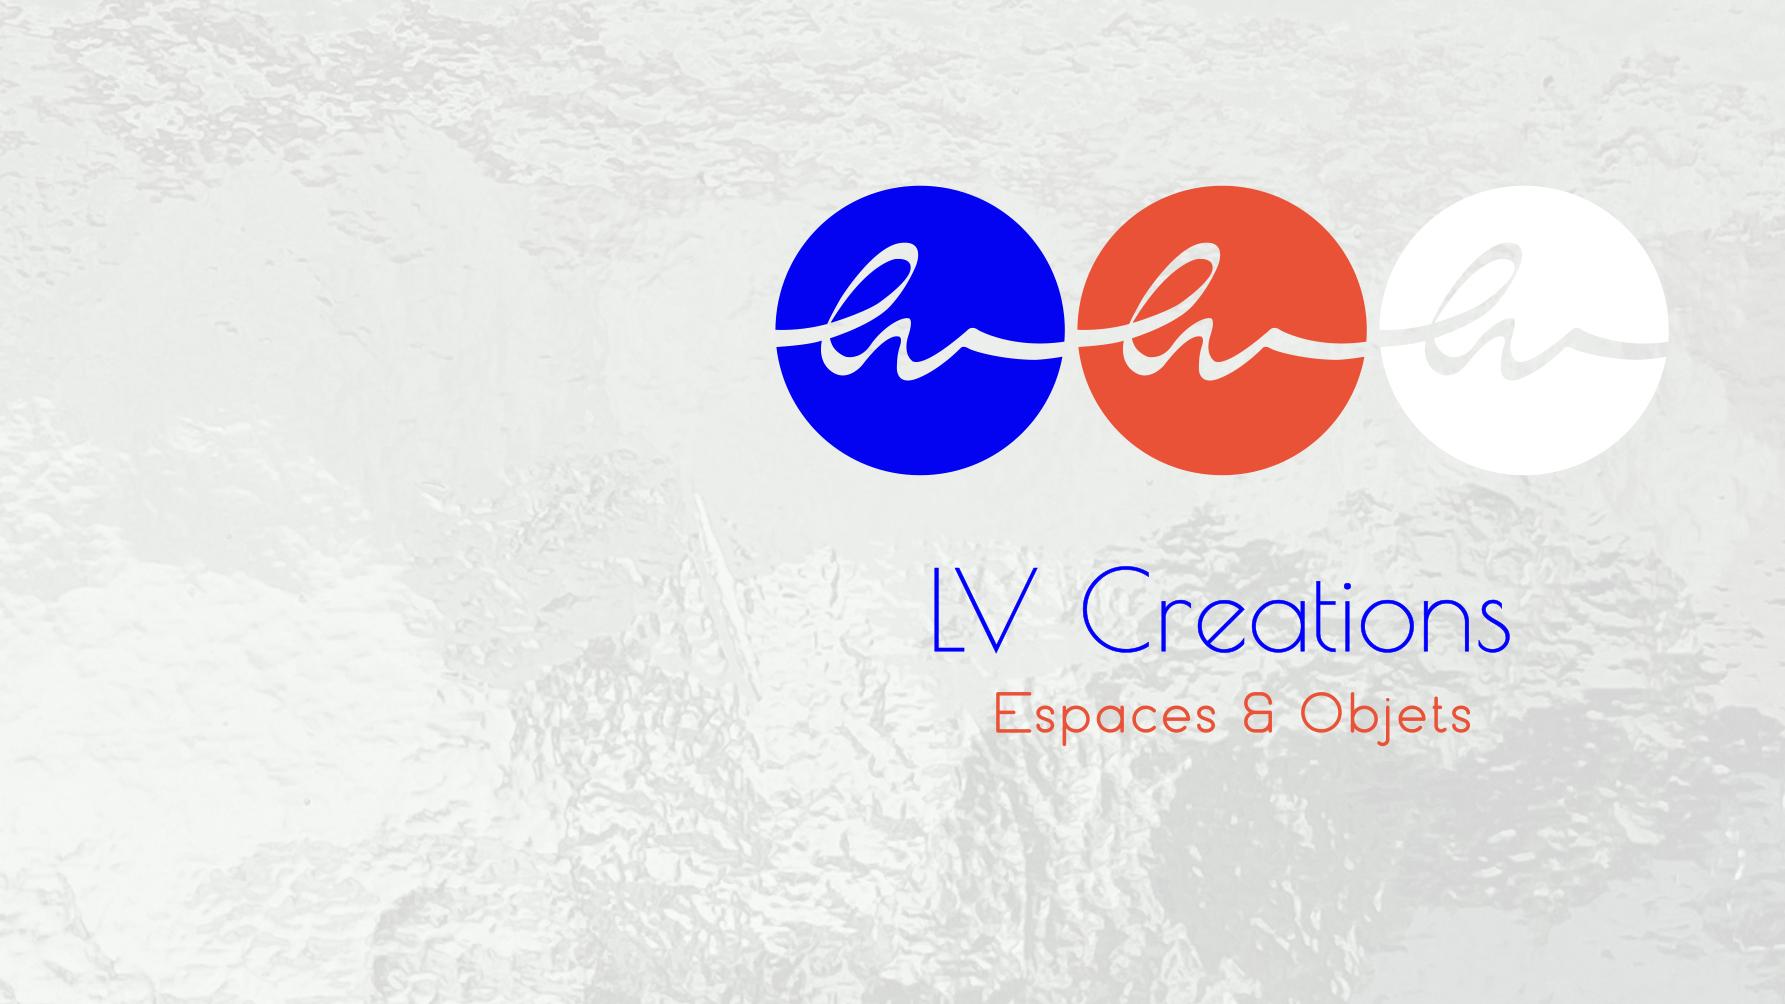 LV Creations Logo